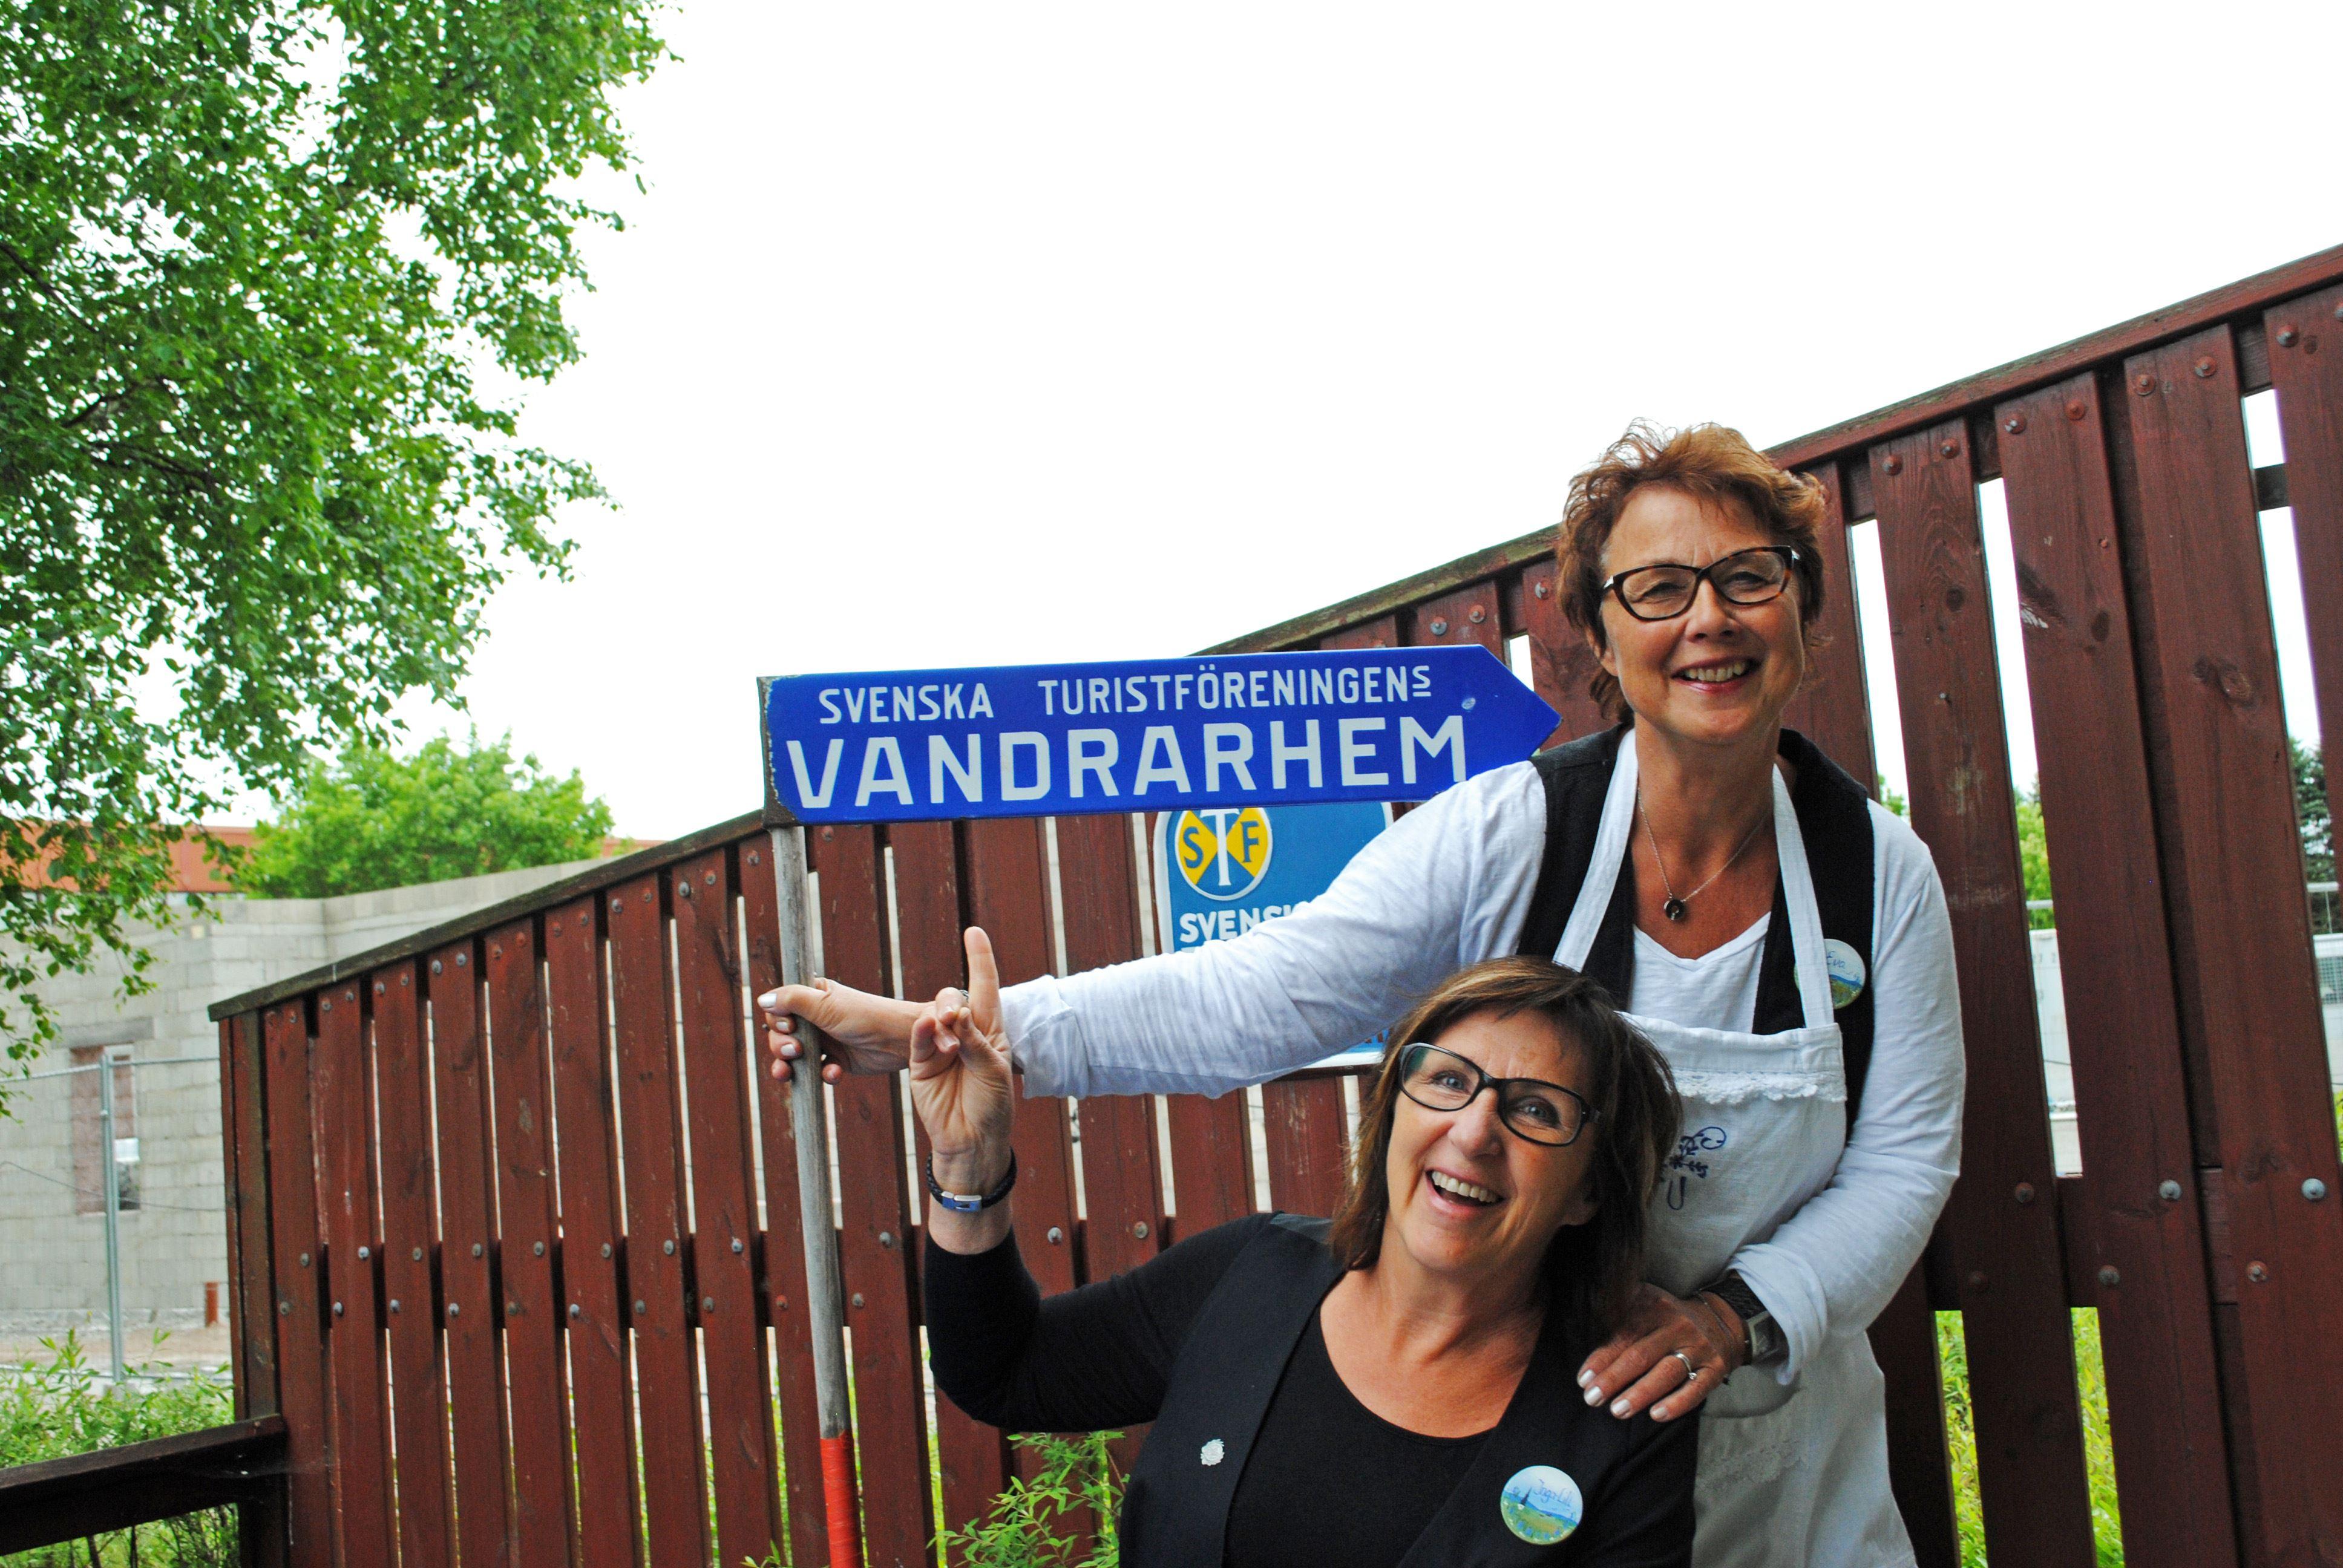 Turistlägenheter, STF Vandrarhem, Borlänge